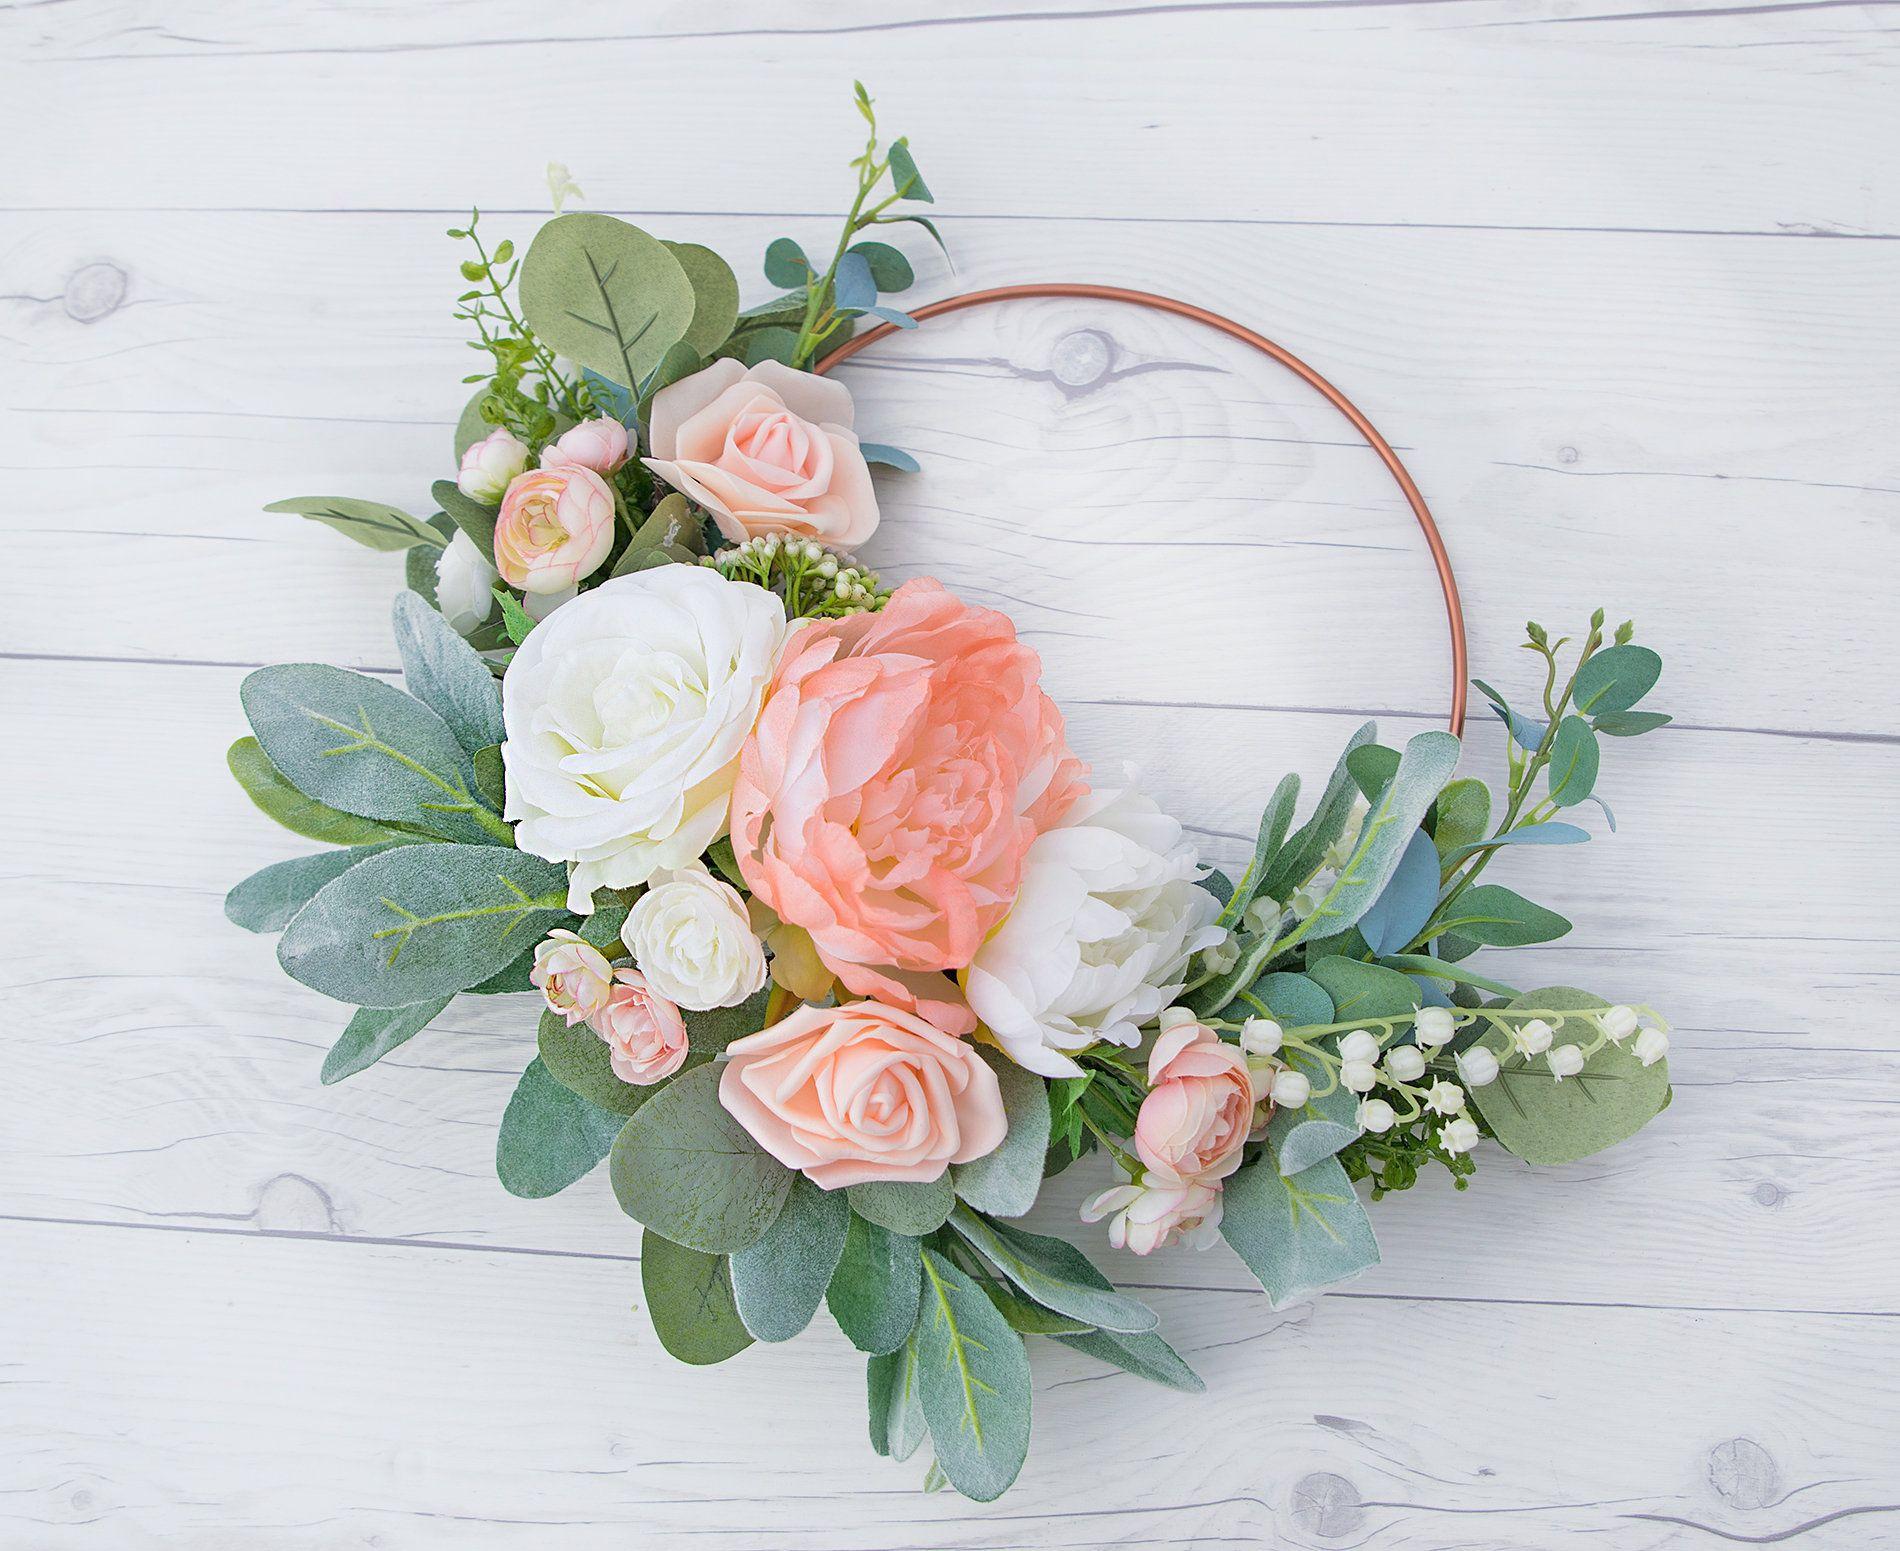 Photo of Boho Hoop, Hoop Wreath, Peach Bouquet, Boho Bouquet, Eucalyptus Hoop, Wreath Bouquet, Bridesmaid Hoop, Blush Hoop, Eucalyptus Boho Wreath